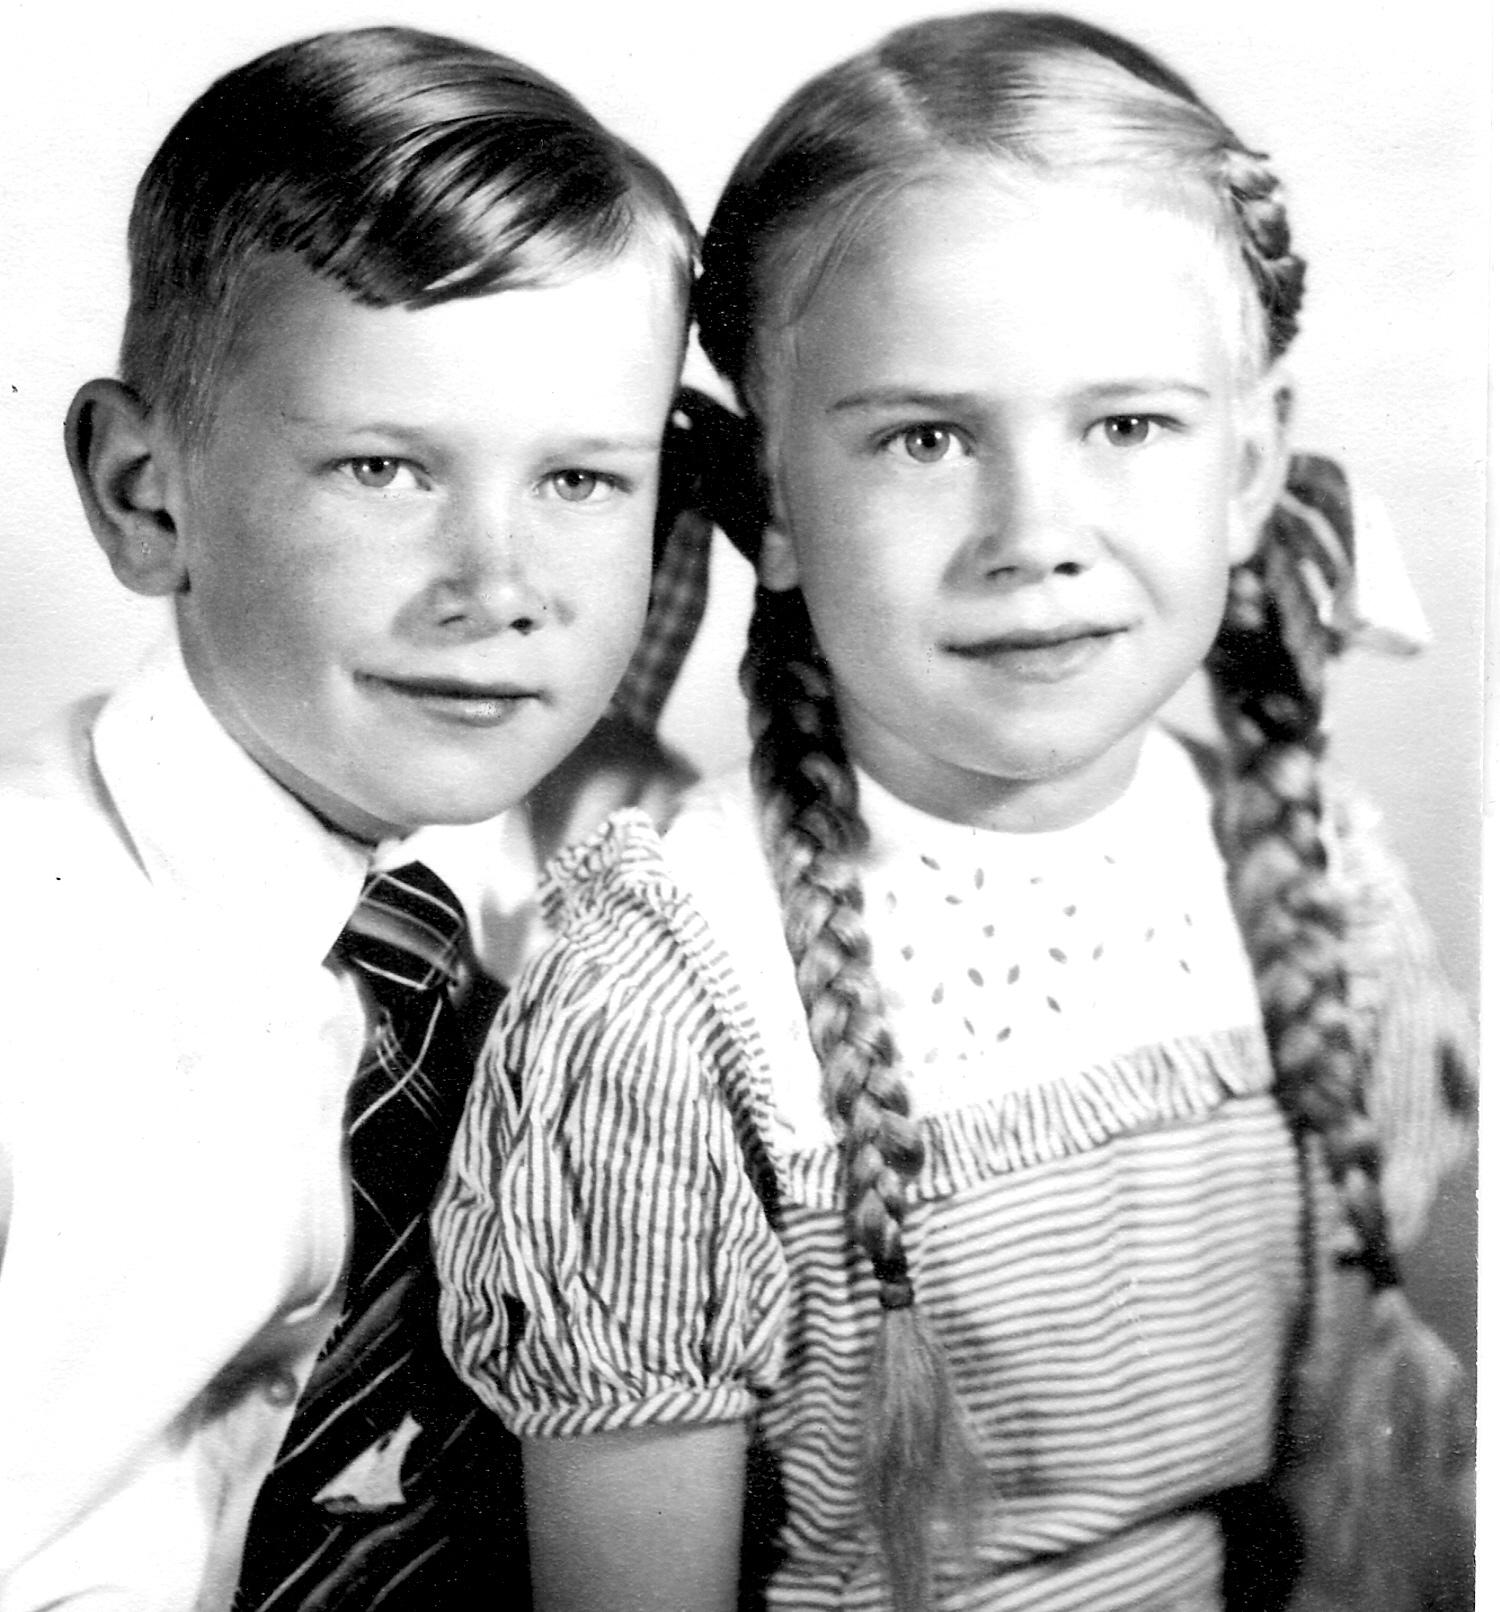 Grant & Merdy Hayes